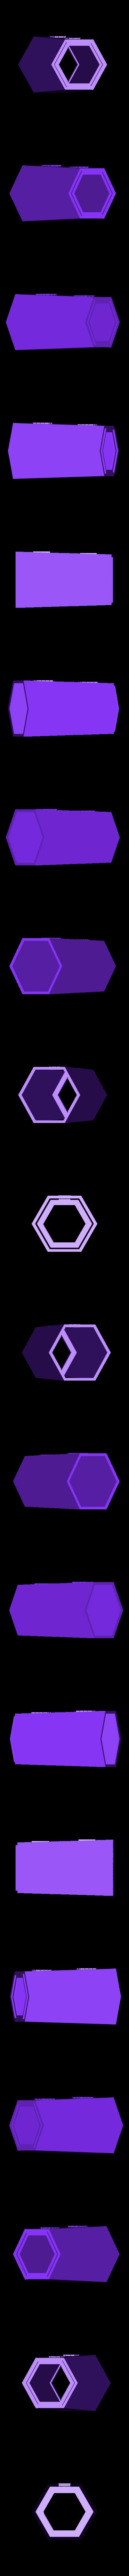 LH_hexa_body2.stl Download free STL file Hexagonal Base Lighthouse Model • 3D printable model, Ogubal3D